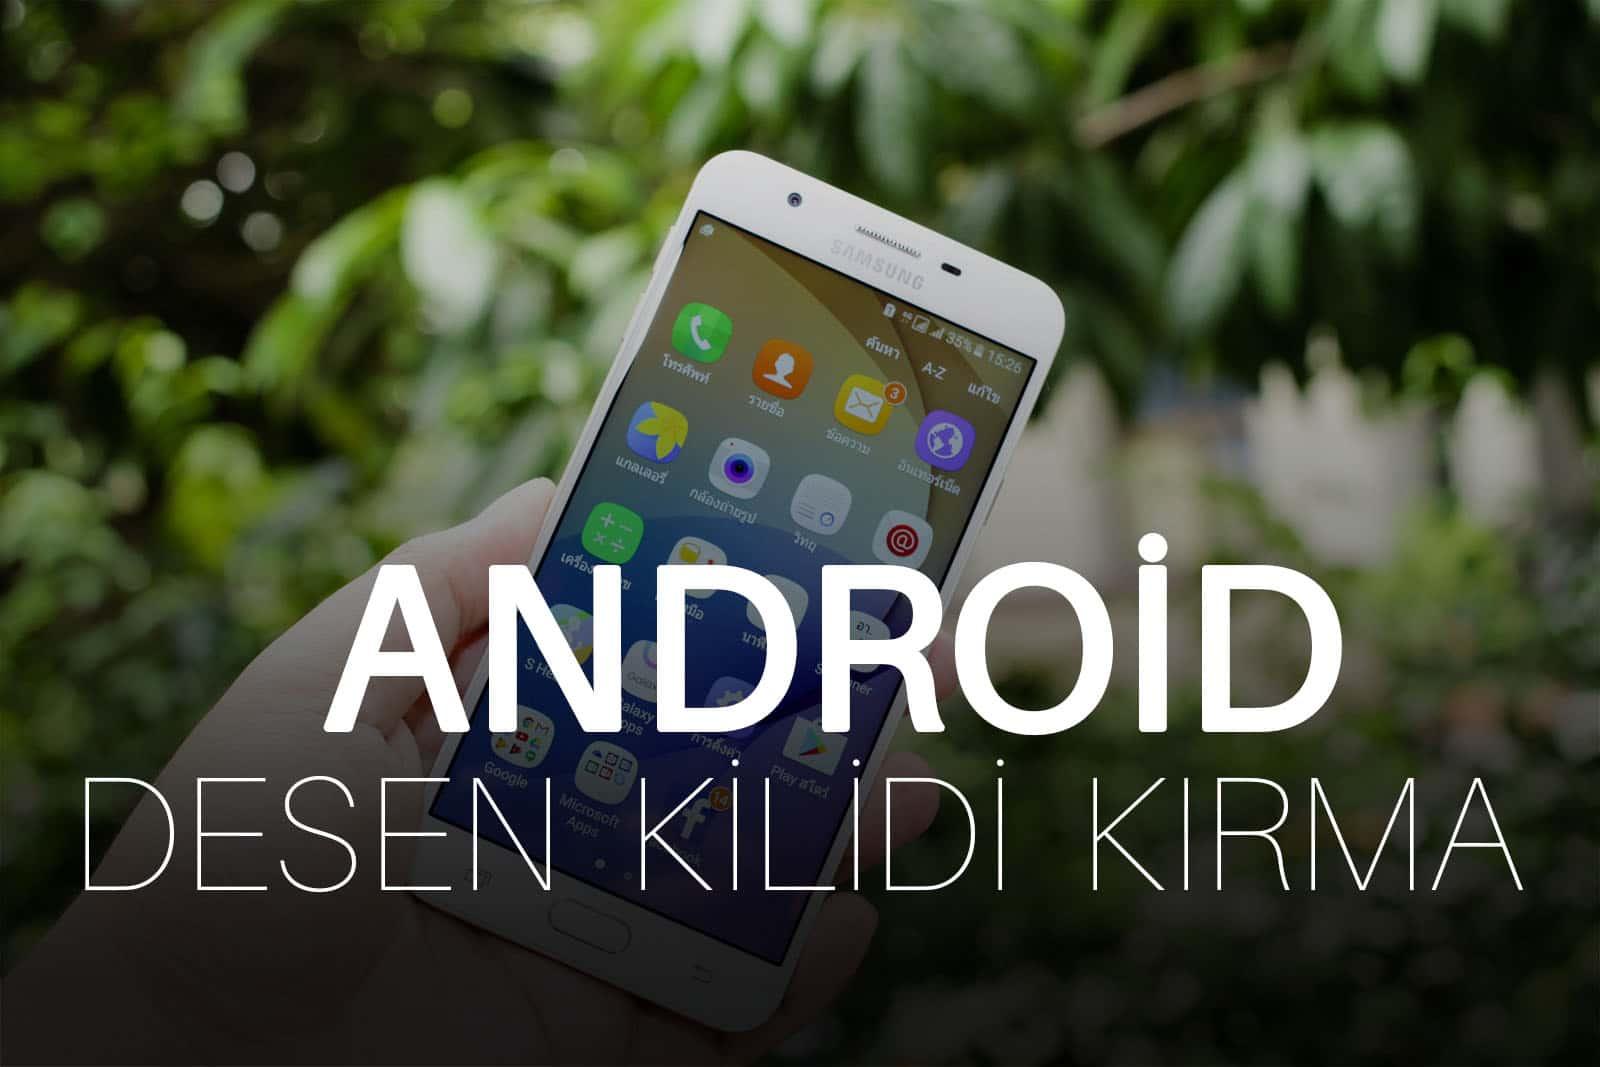 Android Desen Kilidi Kırma